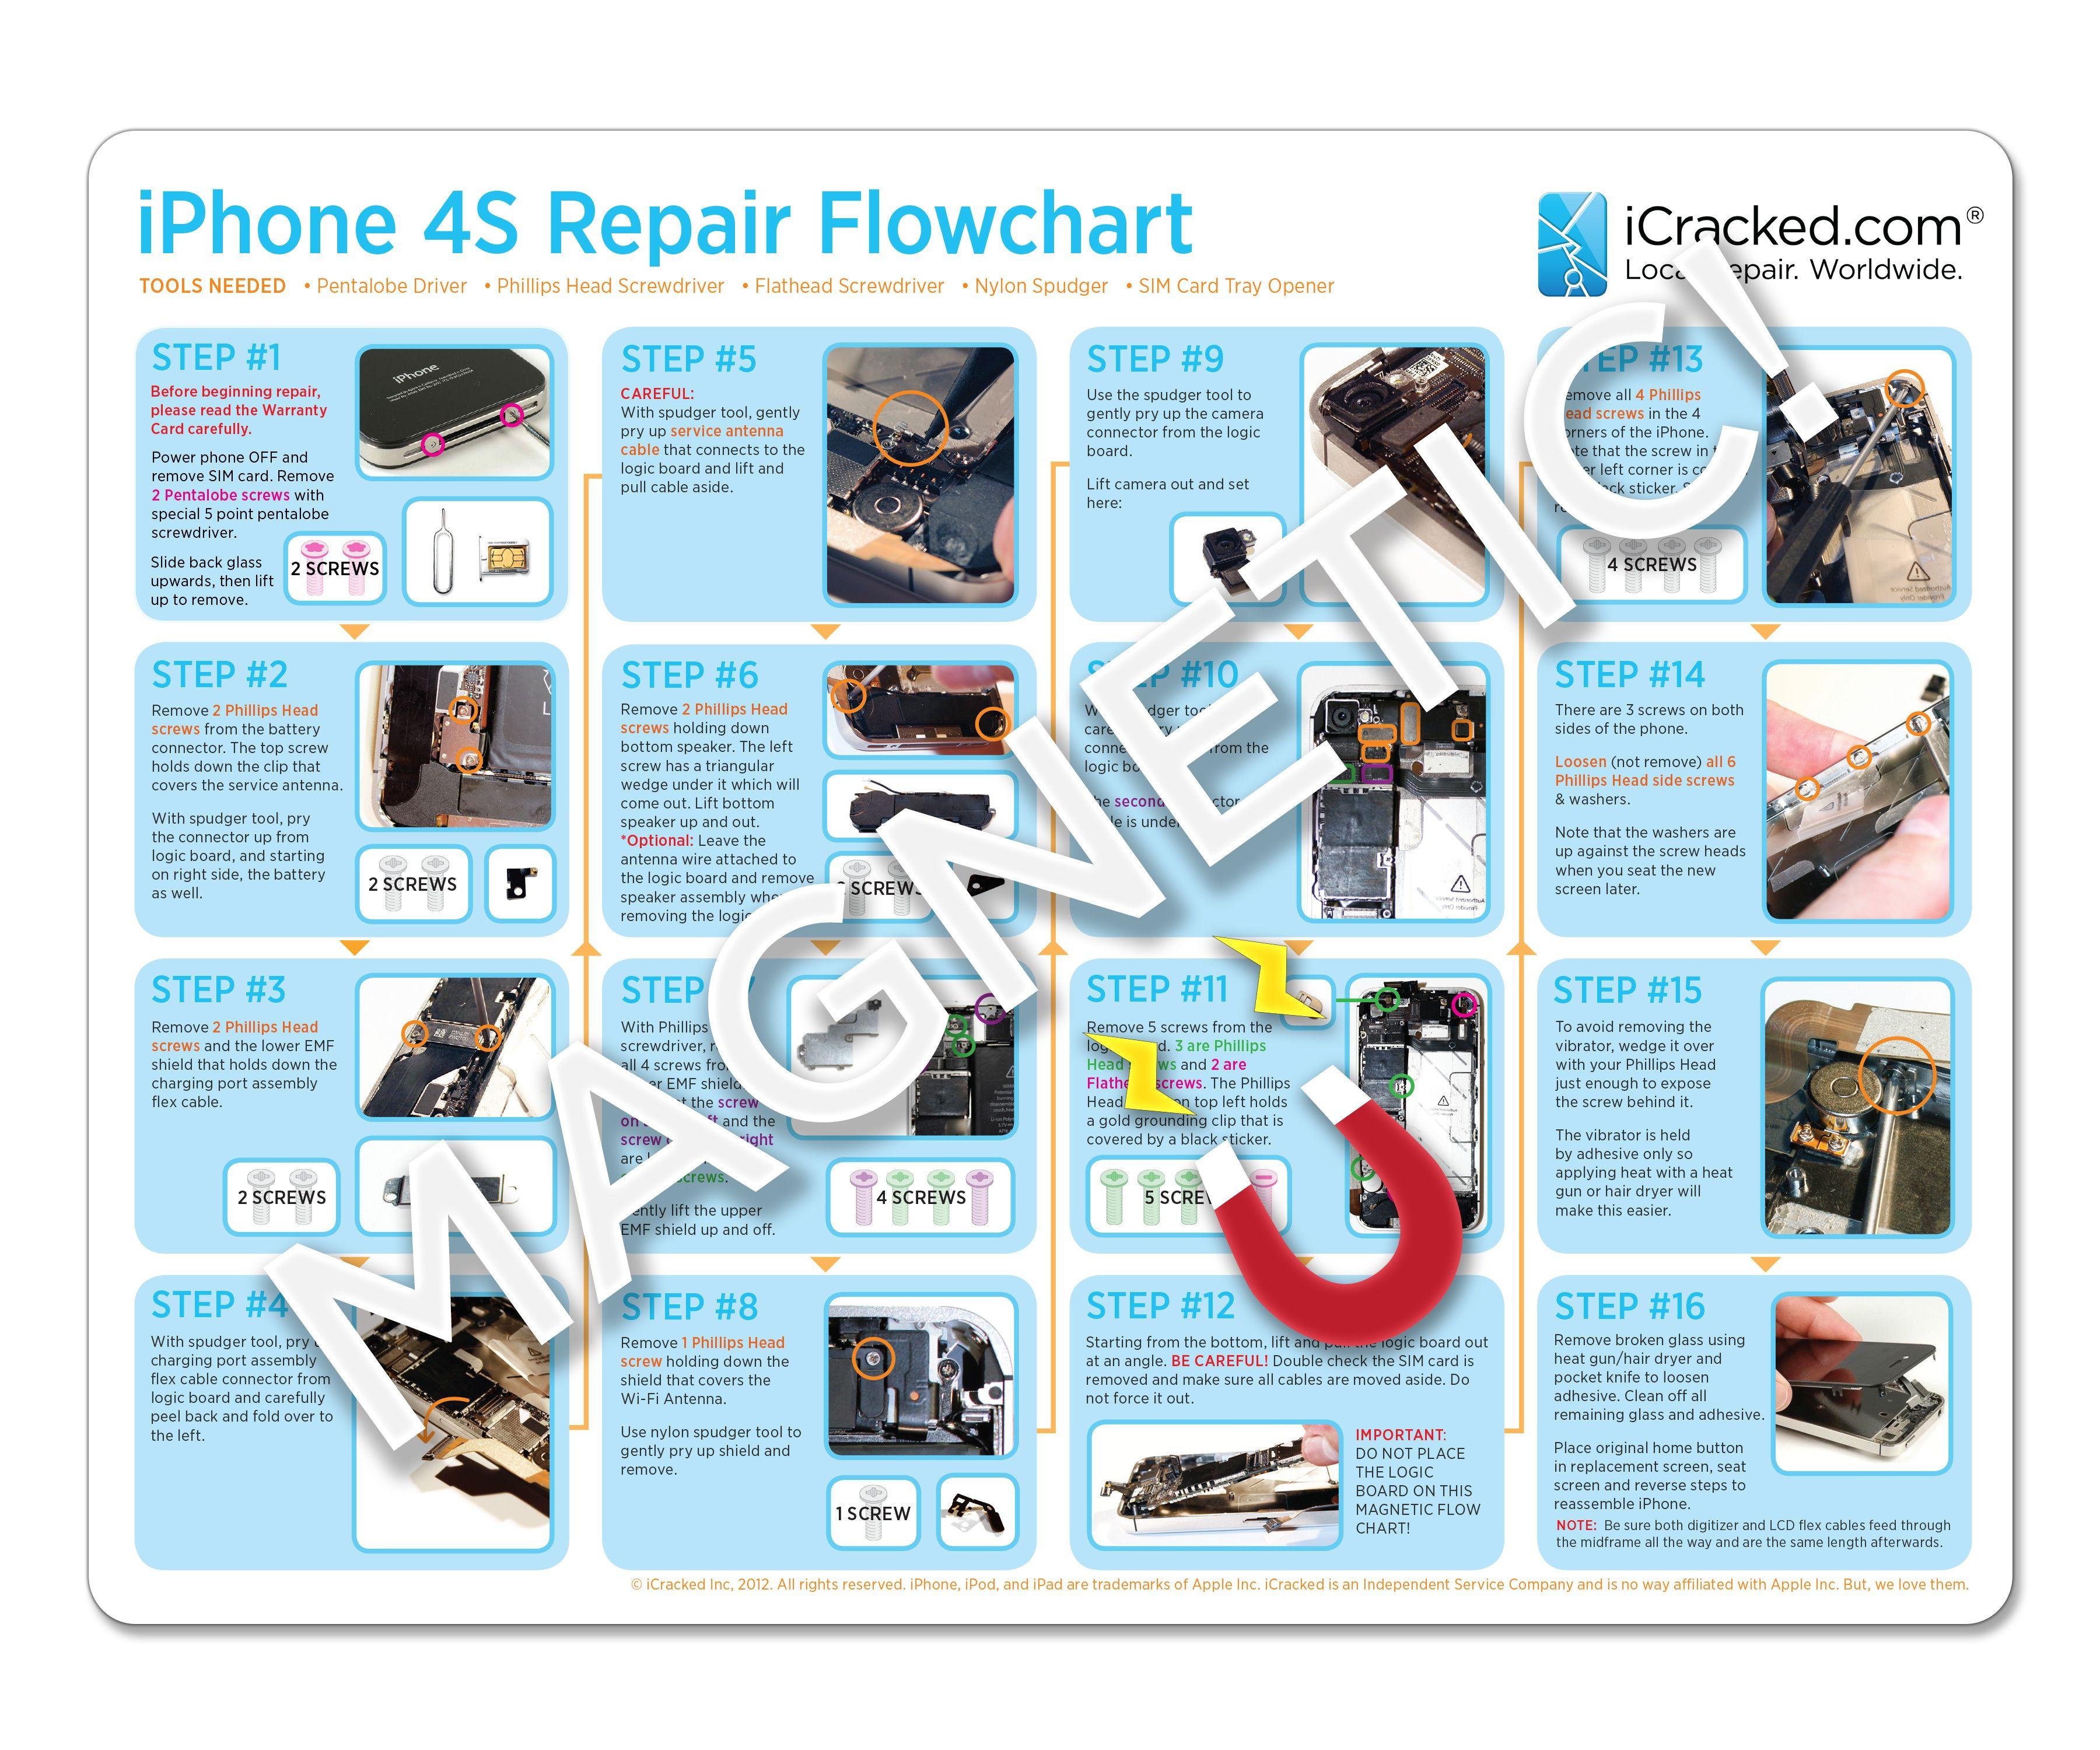 Icracked On Demand Iphone Ipad And Galaxy Device Repair Worldwide Iphone 4s Iphone Repair Iphone